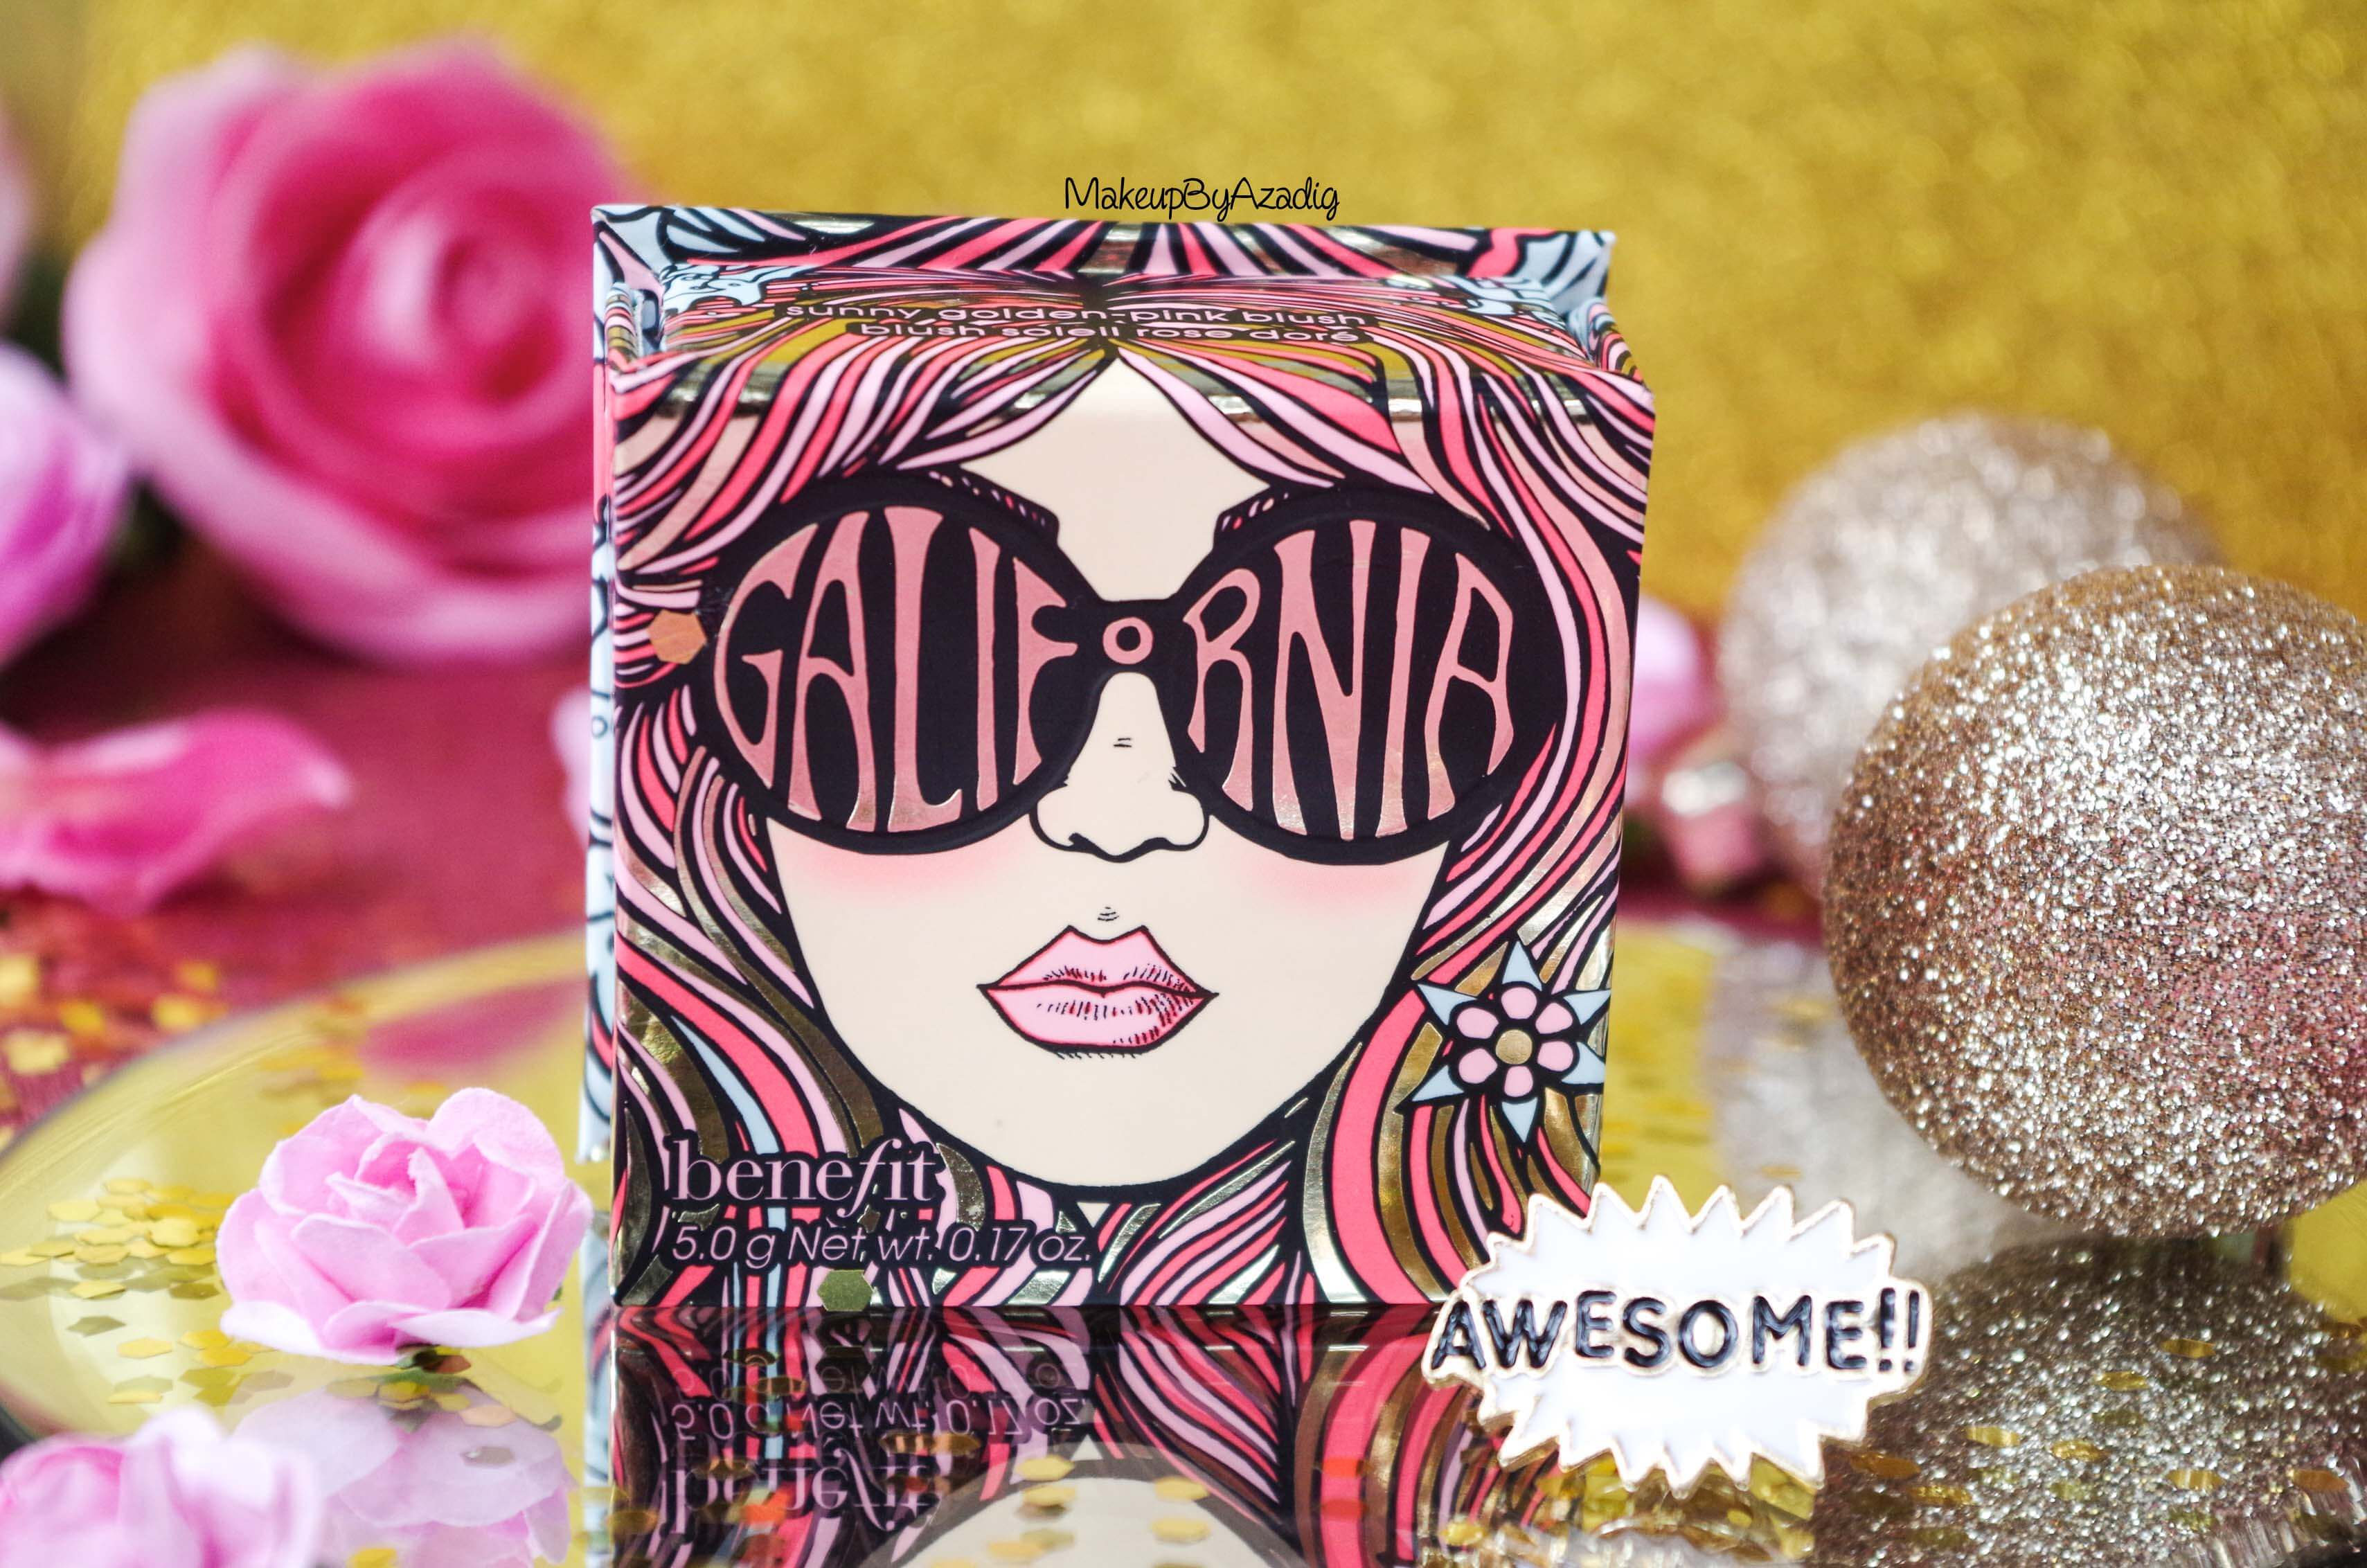 miniature-revue-review-blush-benefit-galifornia-san-francisco-sunny-golden-pink-blush-avis-prix-sephora-makeupbyazadig-coachella